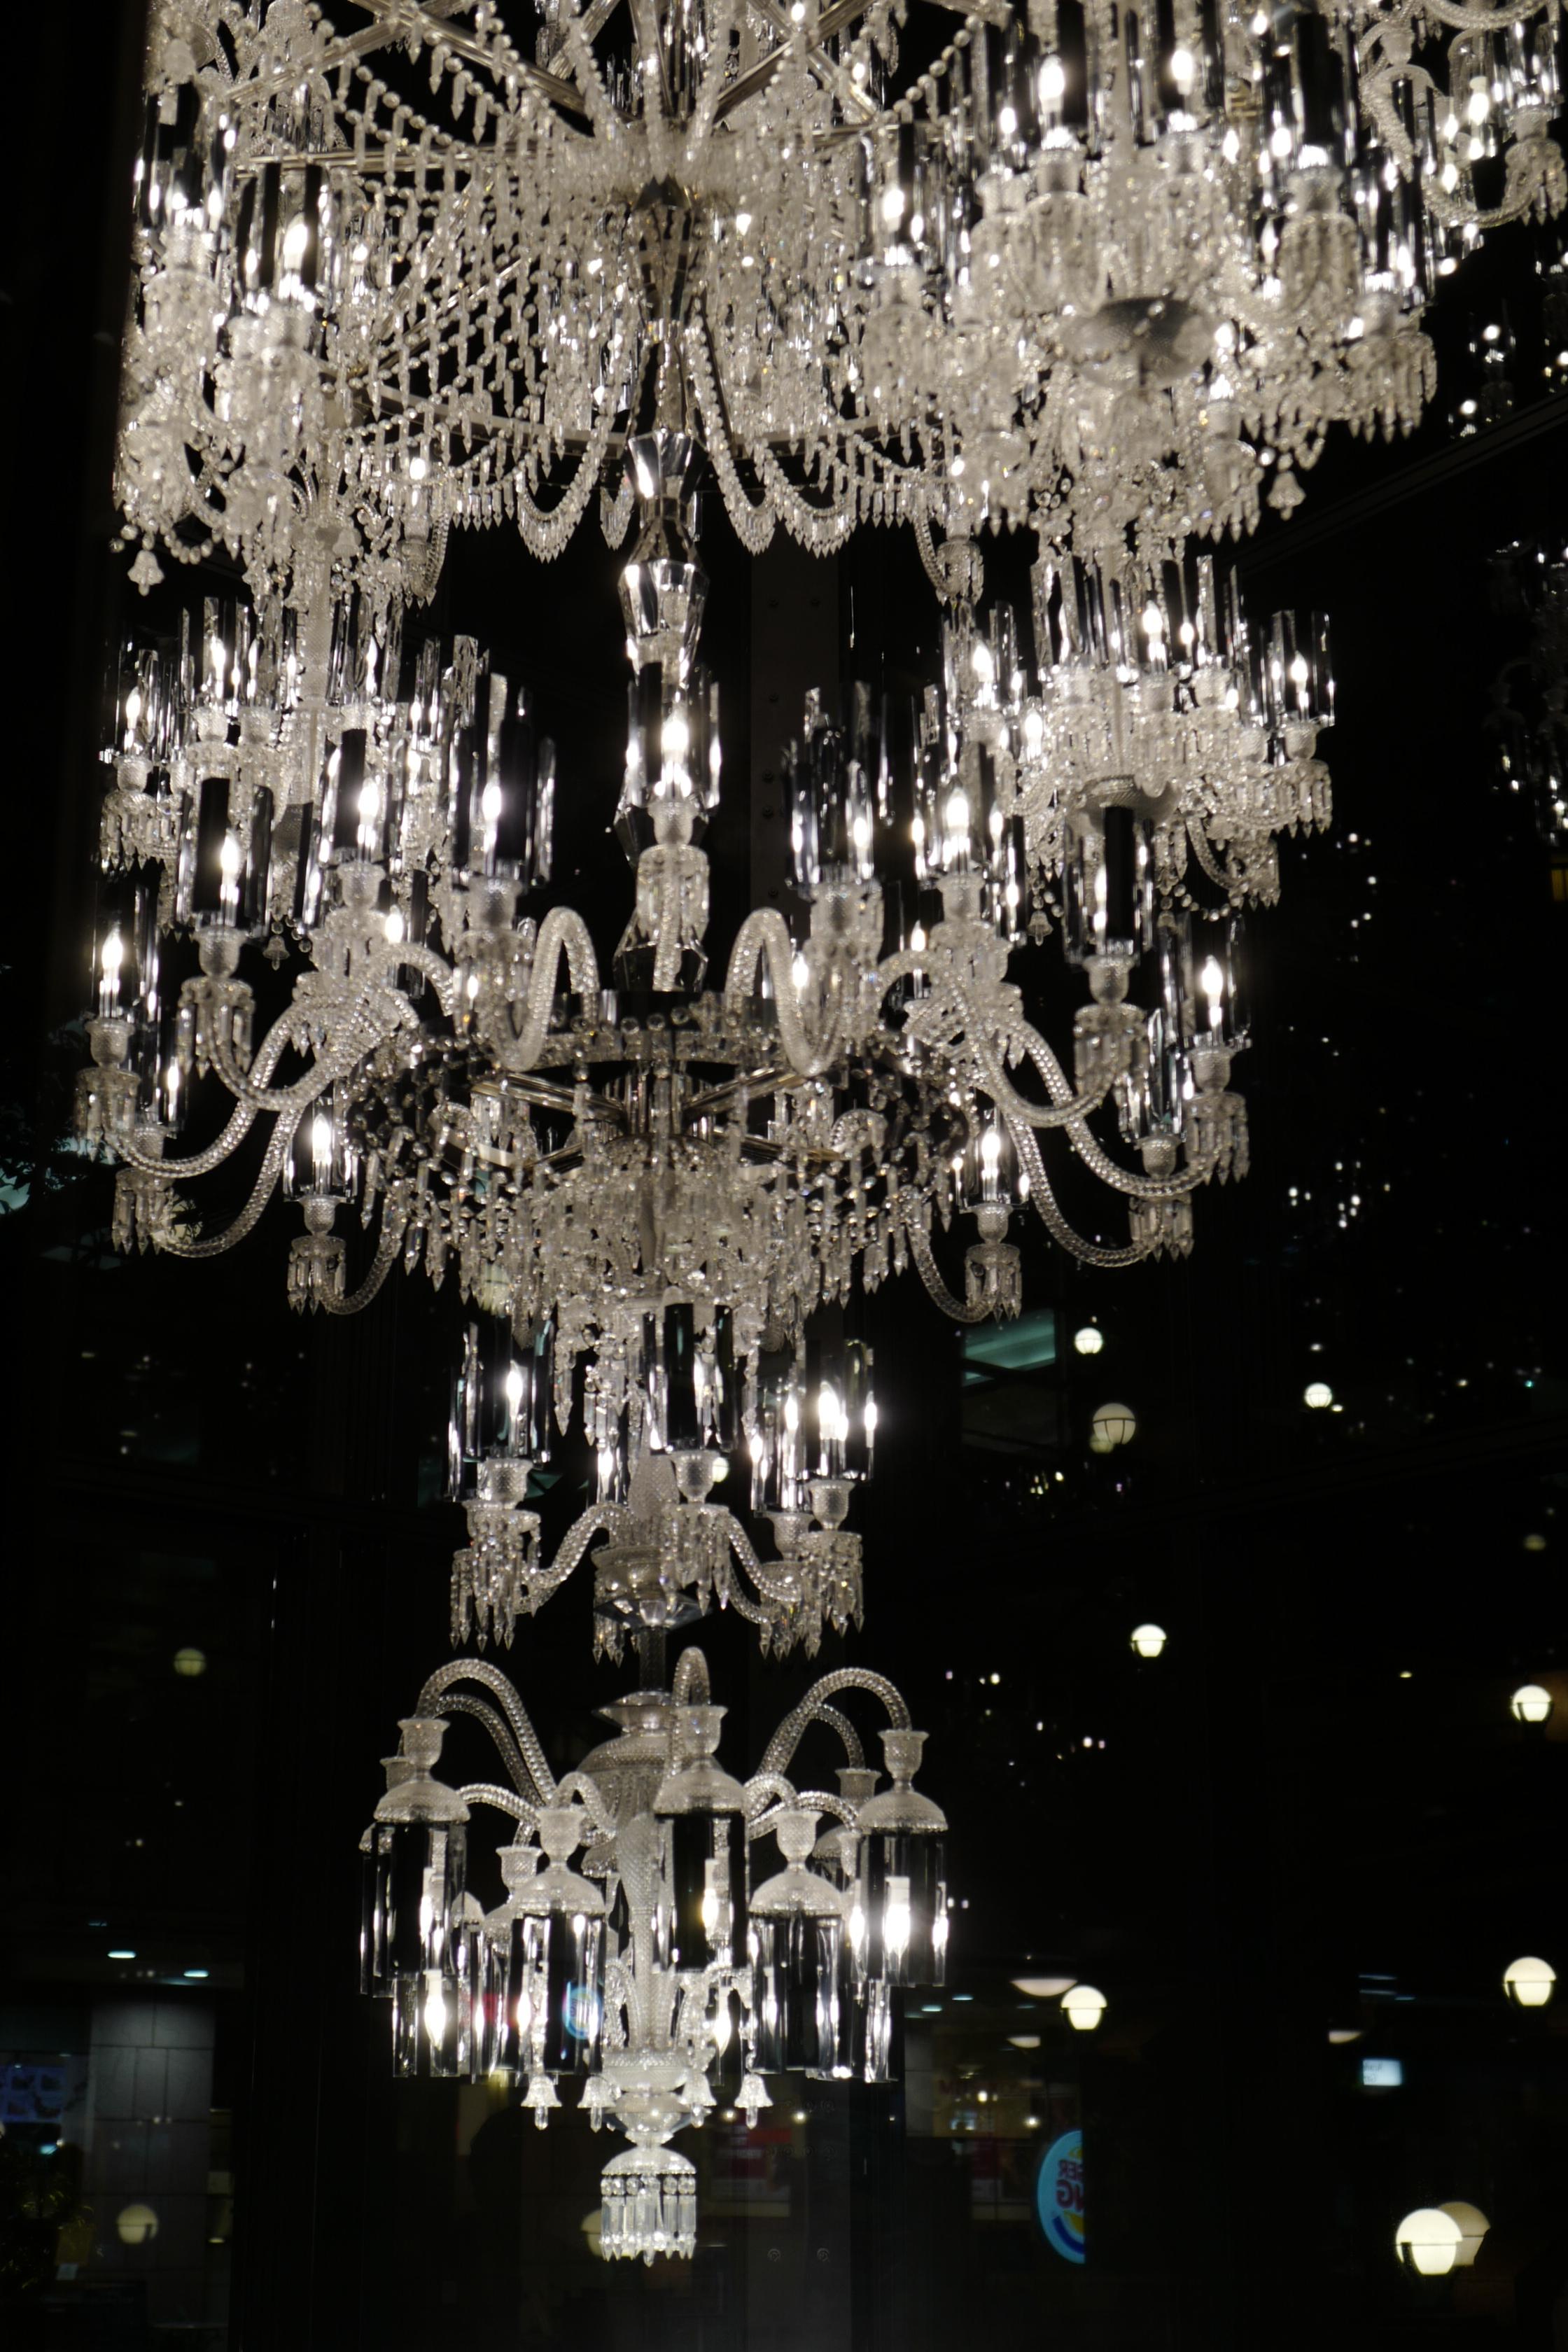 Japan night symmetry christmas lights Leica Tokyo Jp light lighting  chandelier ebisugardenplace baccarat ebisu summilux leicaq